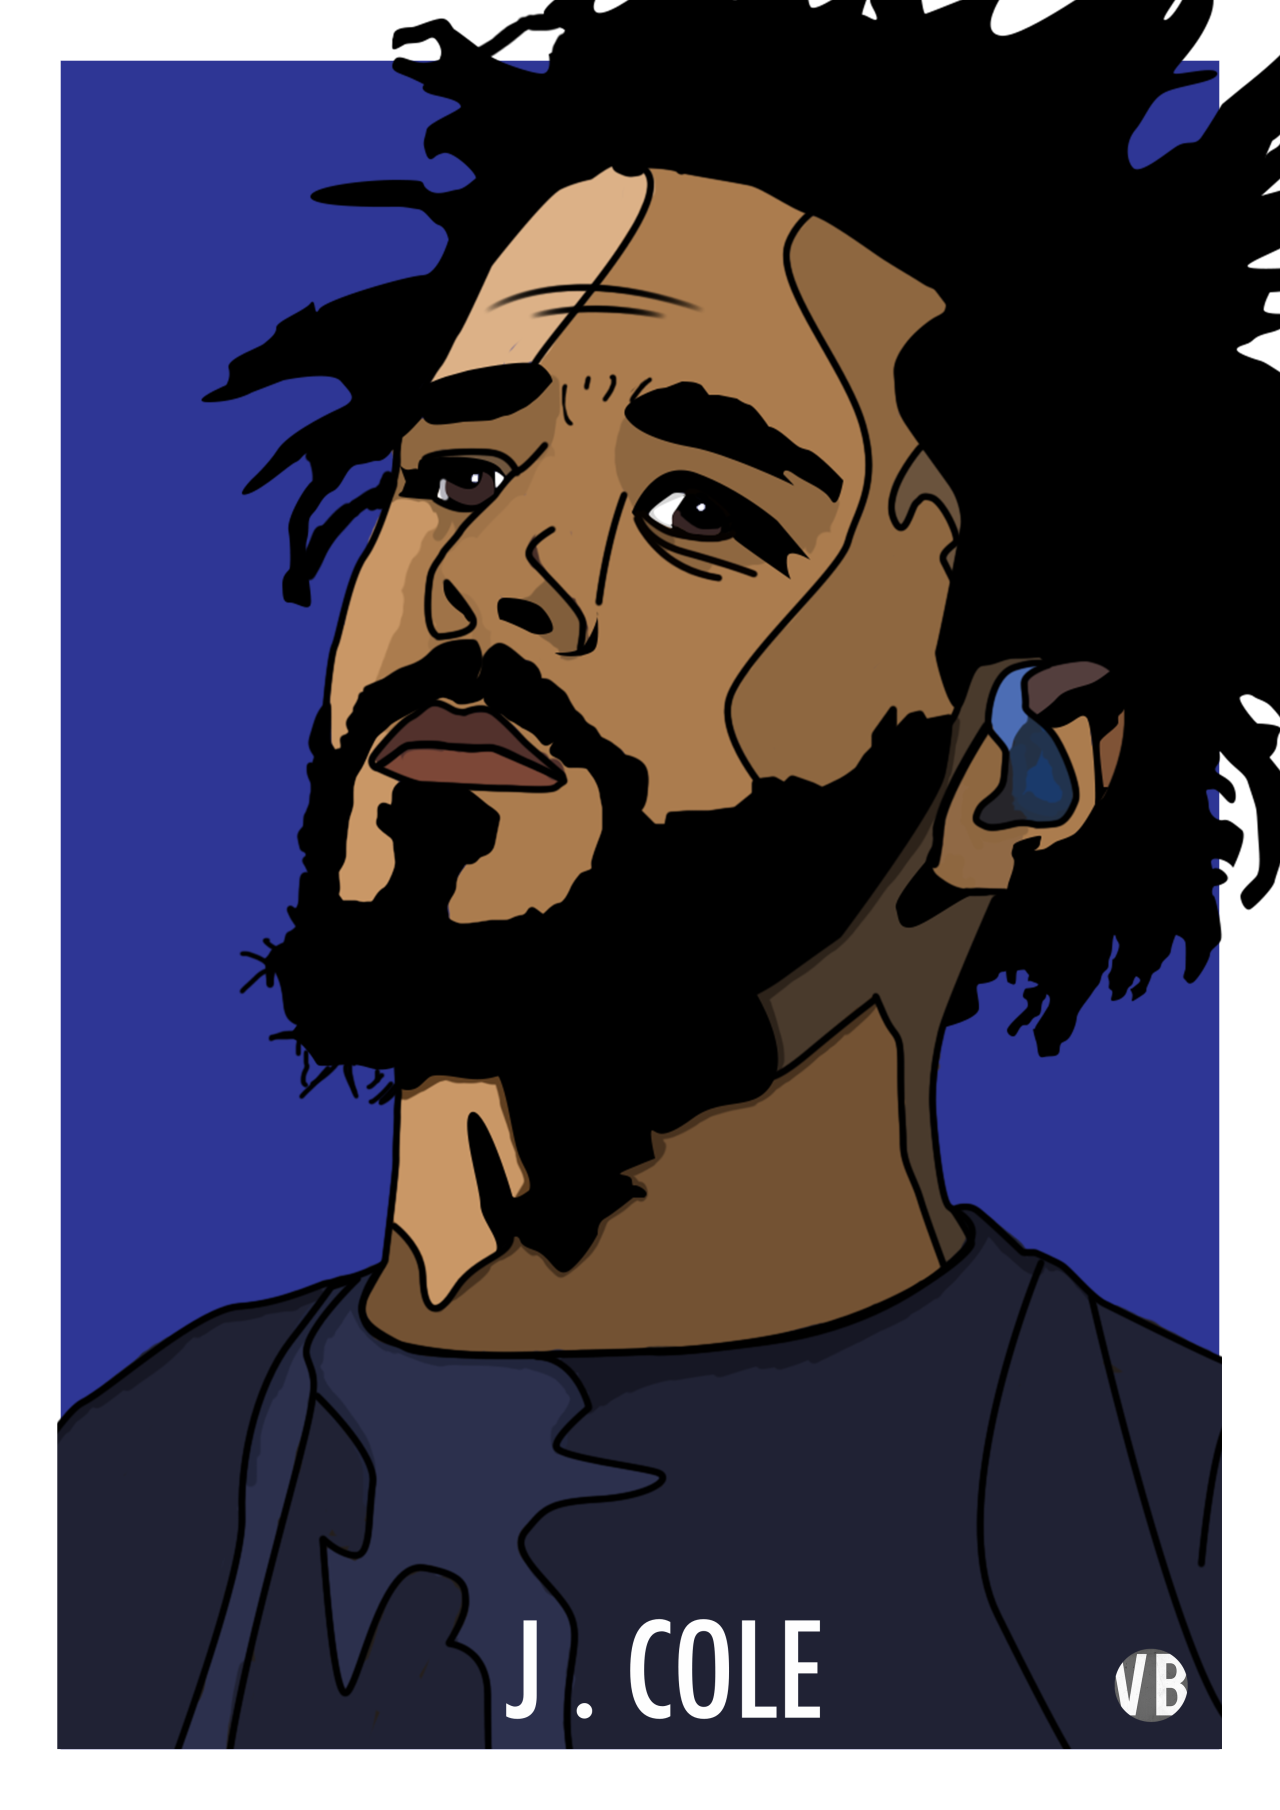 J.Cole and Drake Good Music Pinterest Wallpaper